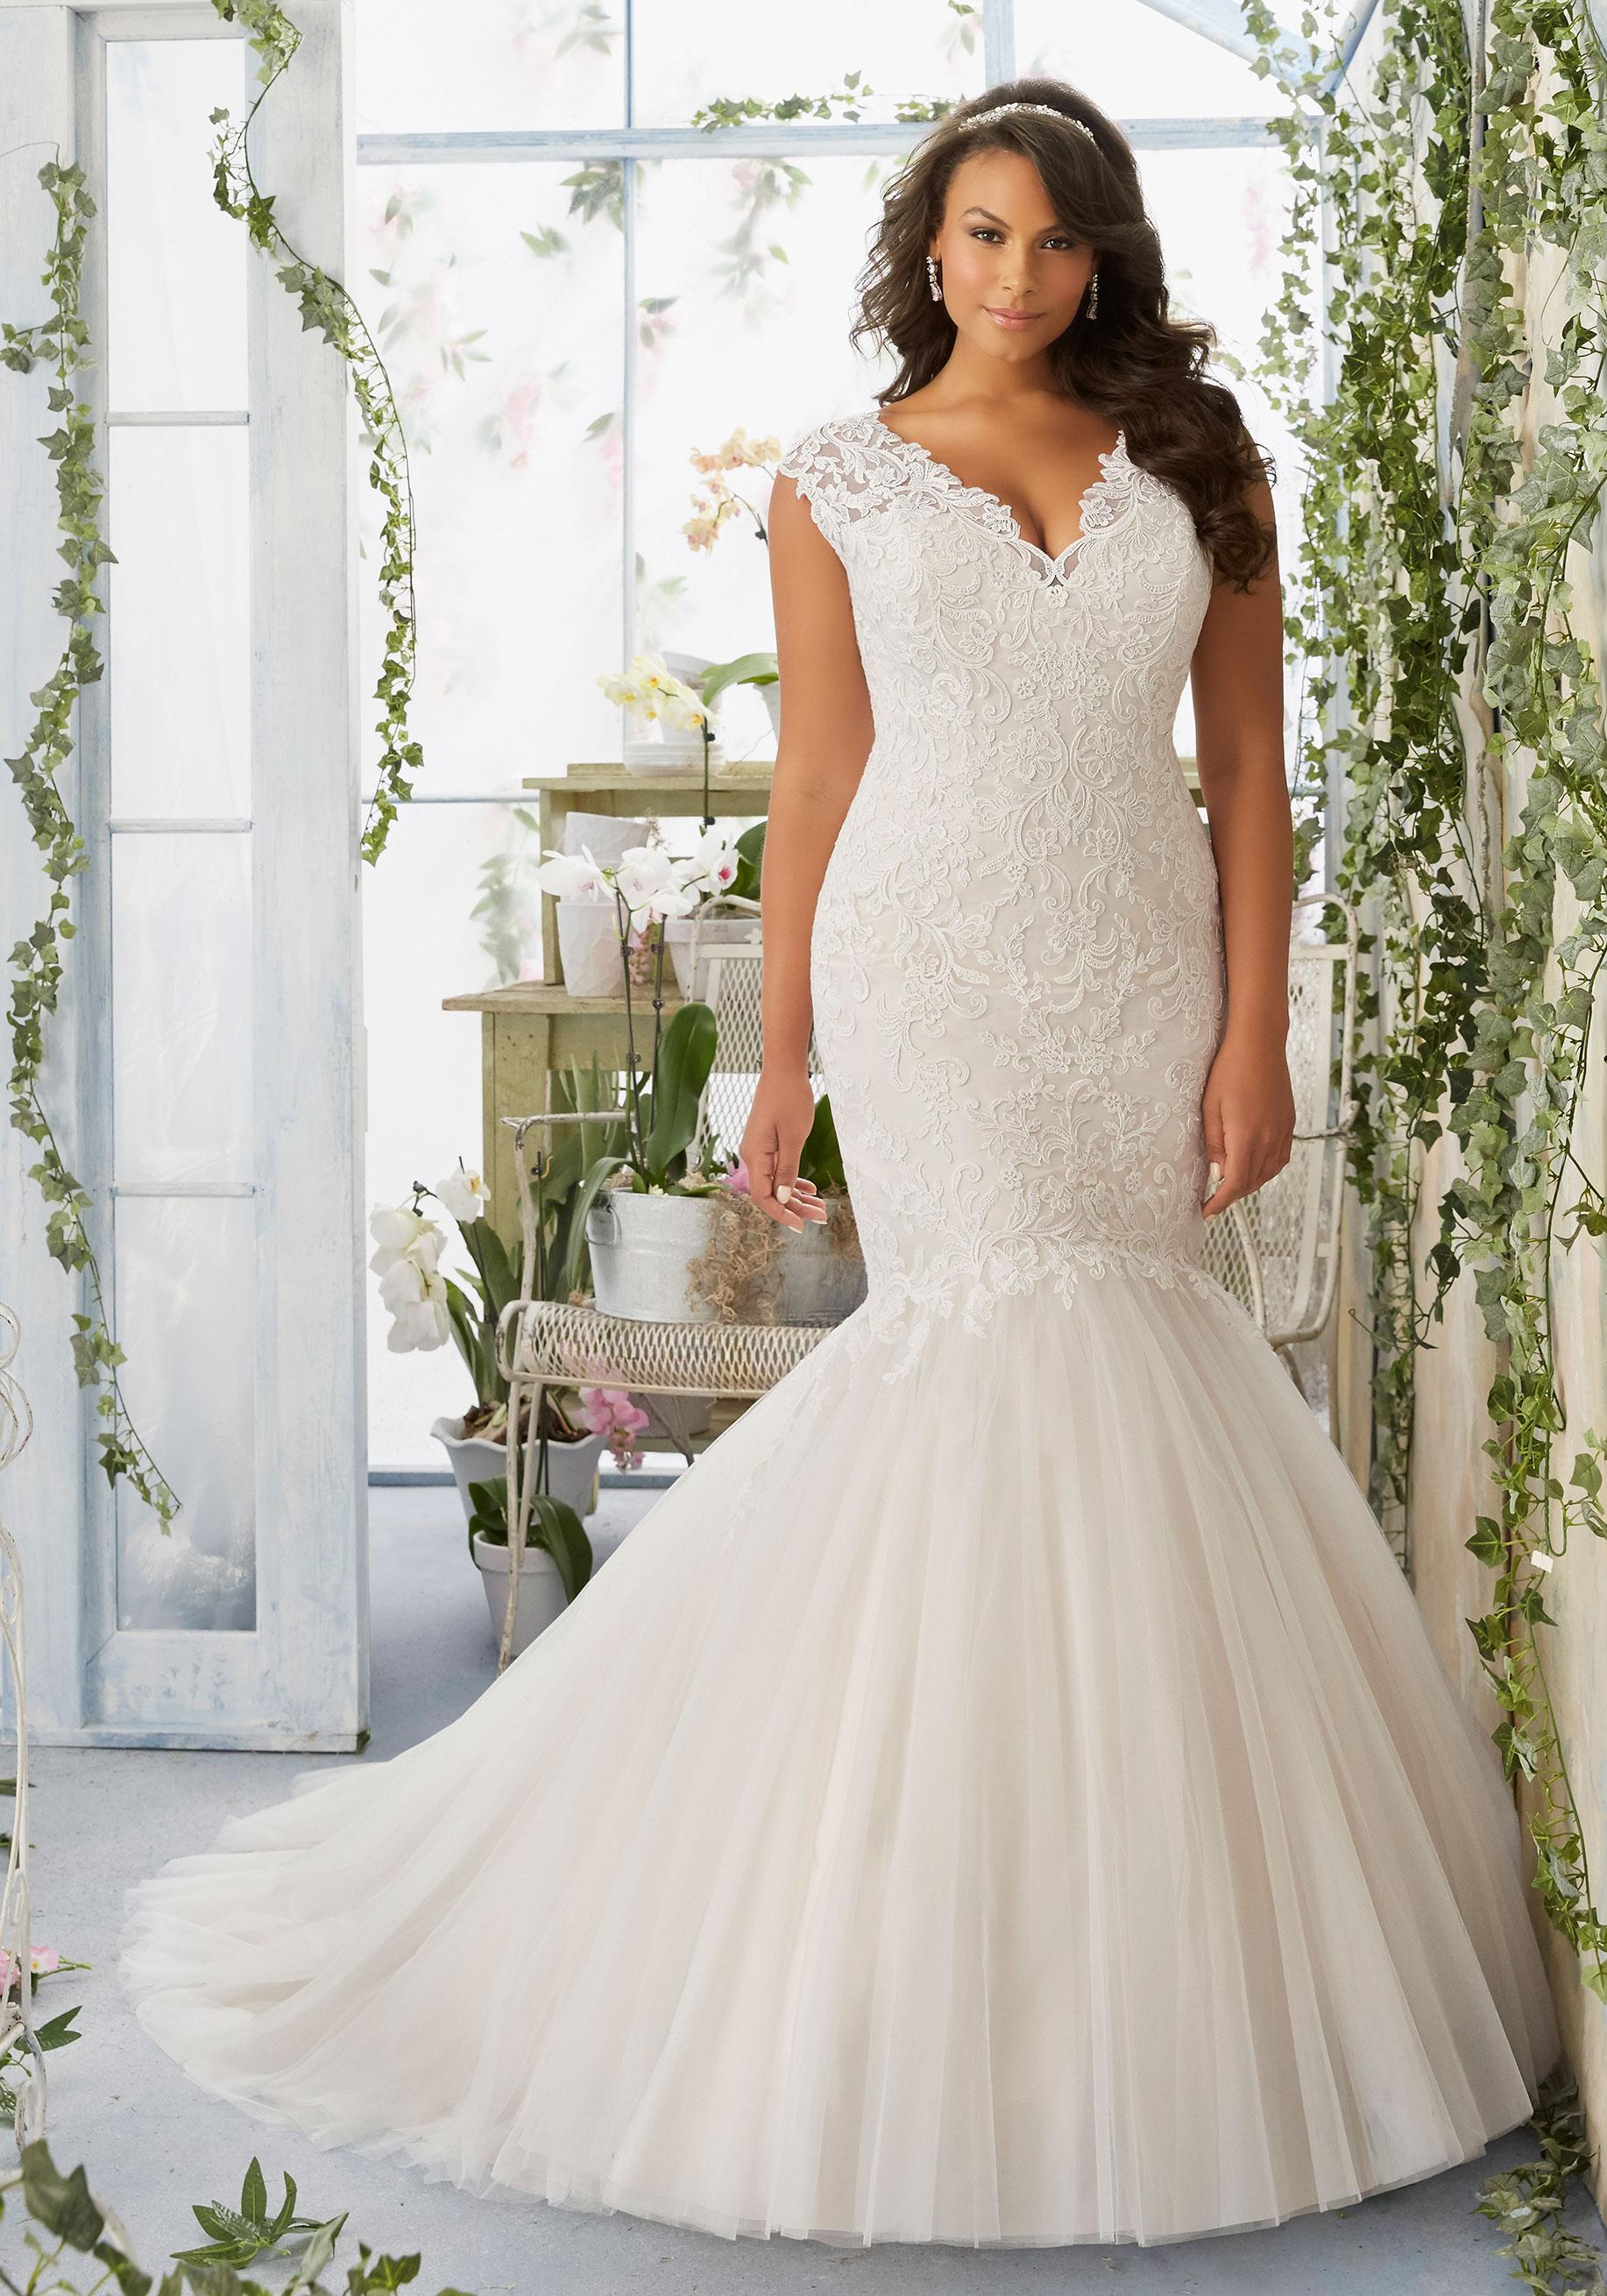 wedding dresses plus sizes photo - 1